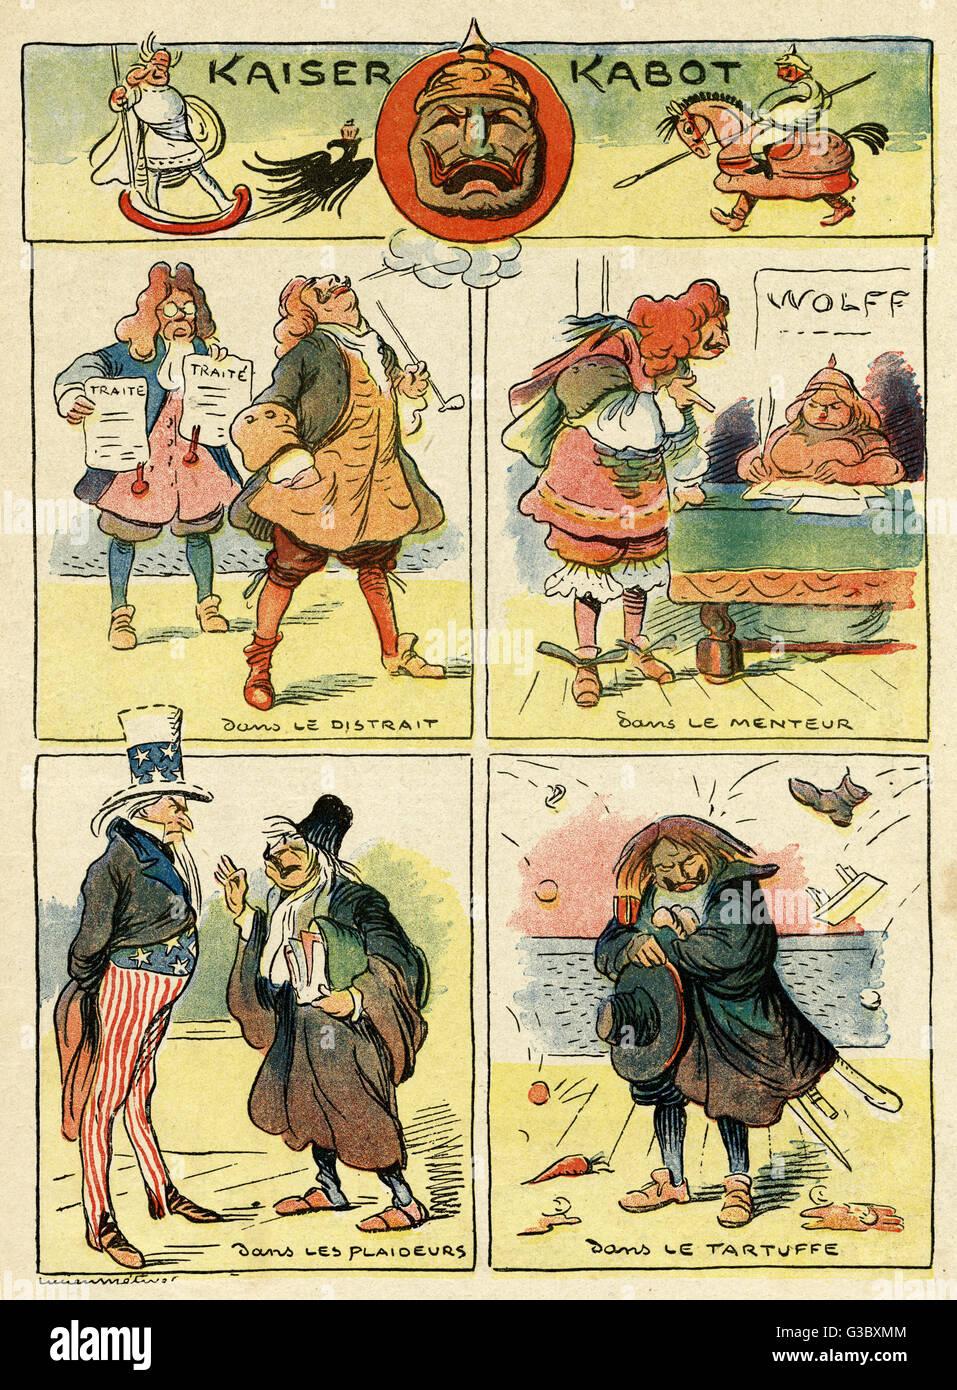 Cartoon, Kaiser Kabot (Kaiser Wilhelm II, the ham actor), showing the German Kaiser in four different theatrical - Stock Image